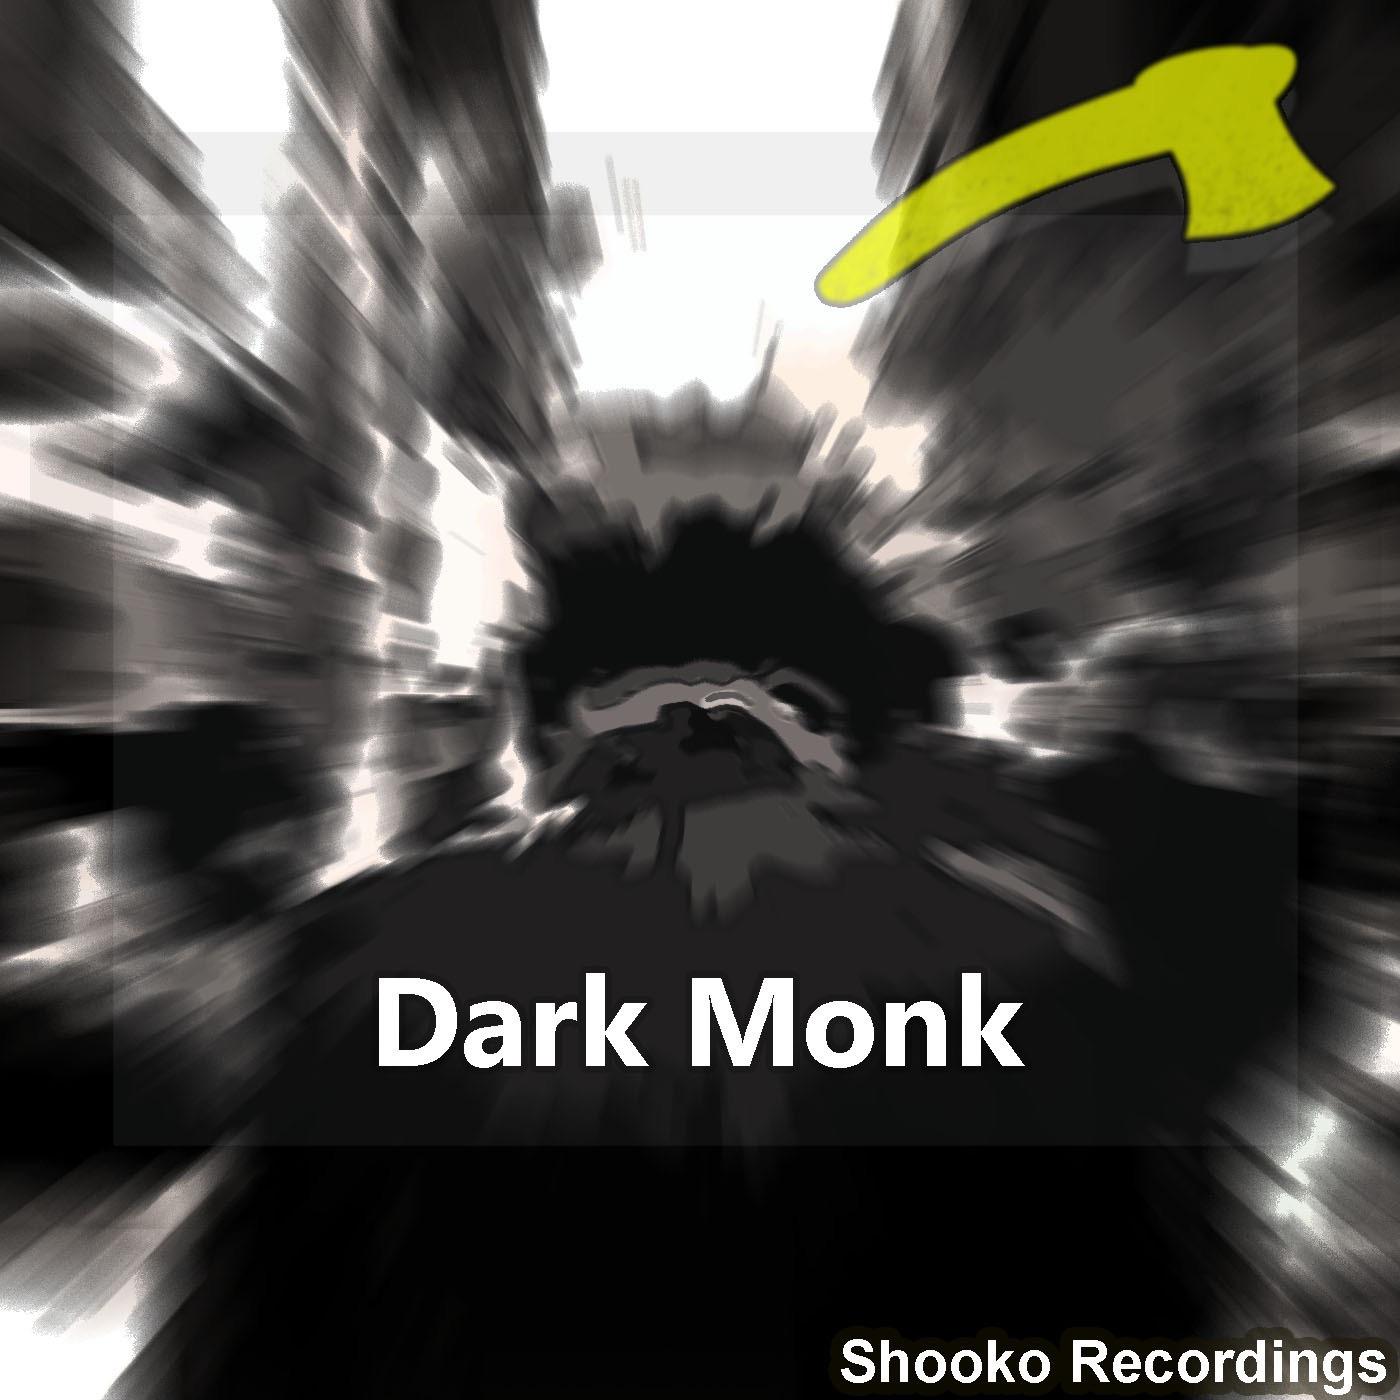 Dark Monk - Single